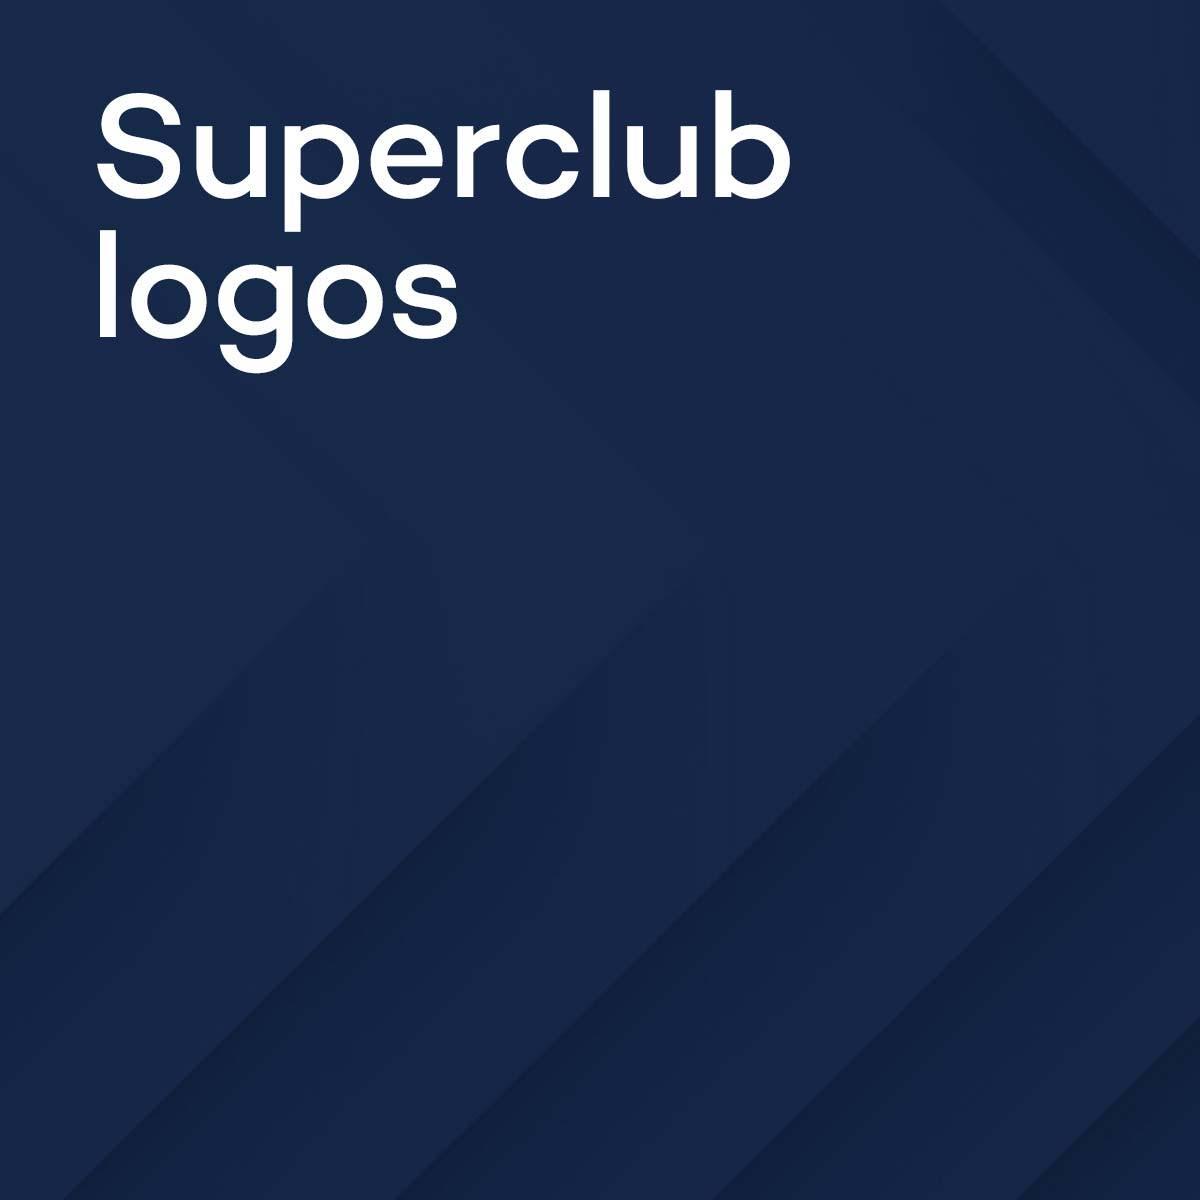 Download Superclub logos